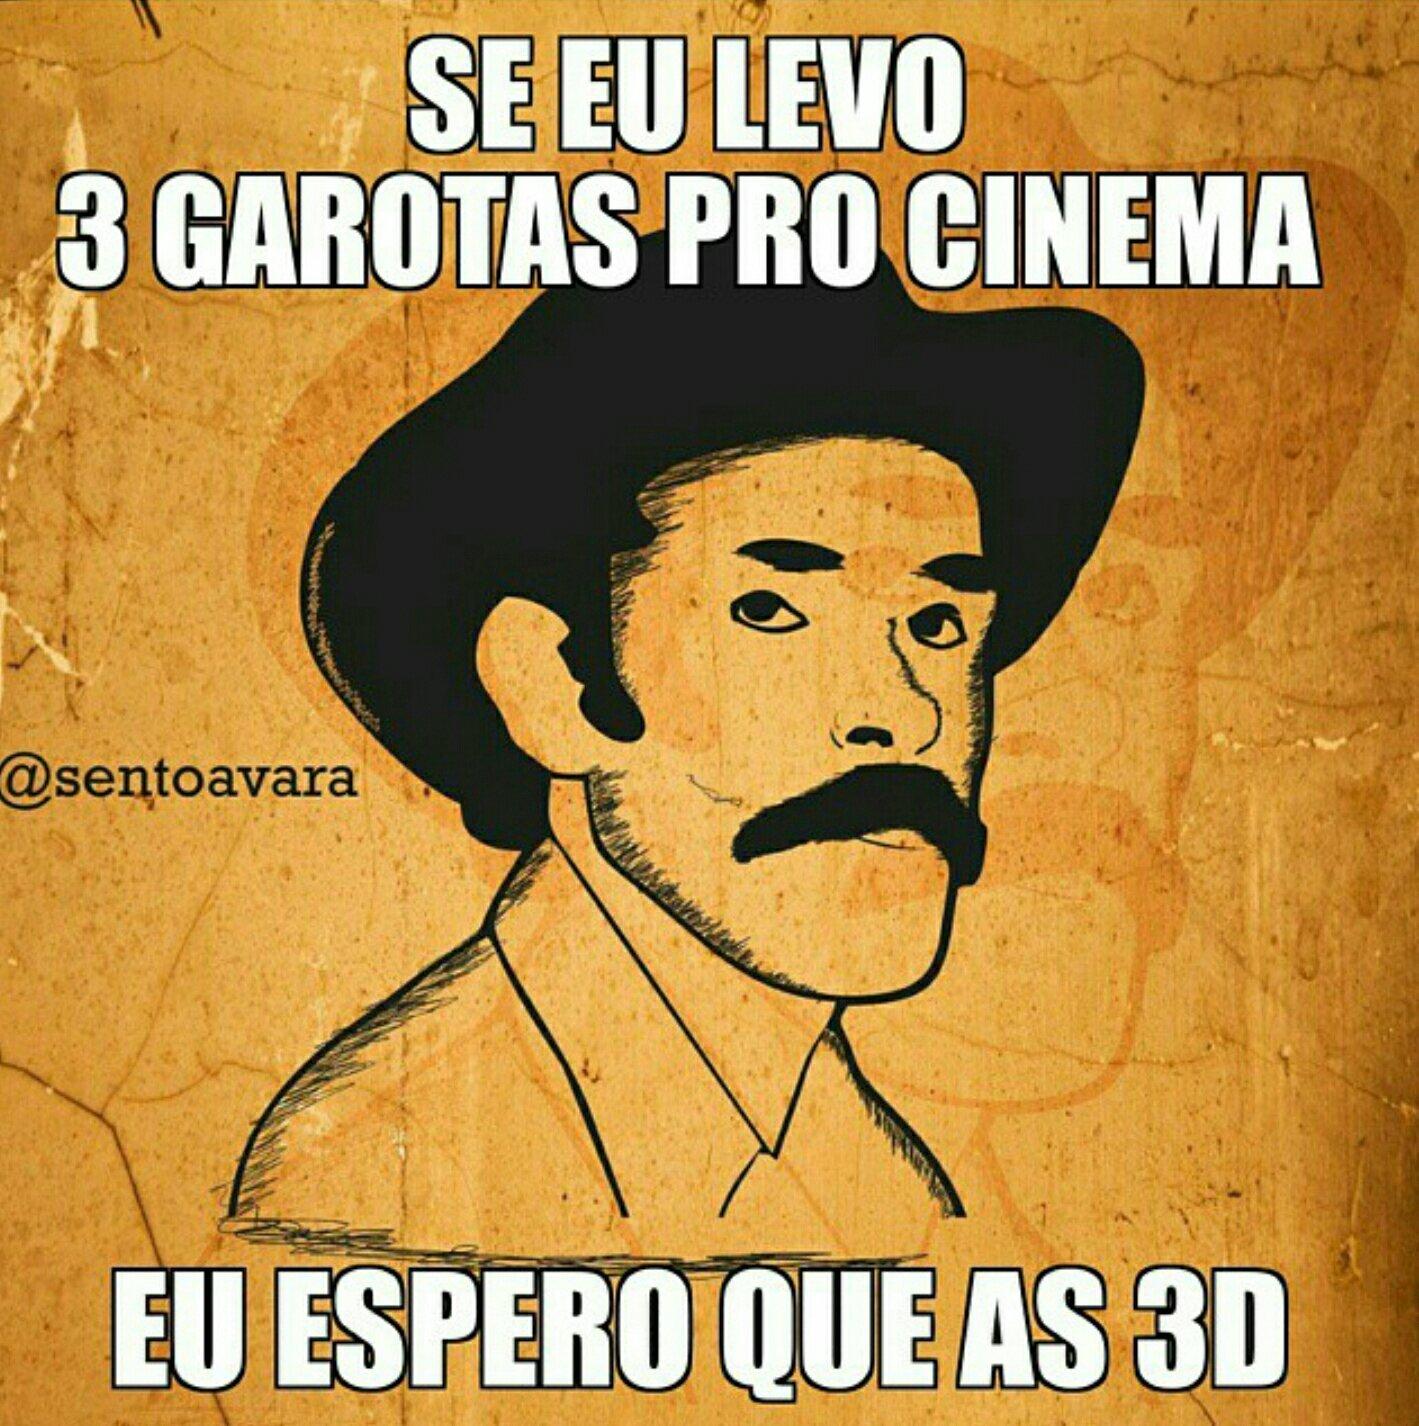 Cineminha maroto - meme